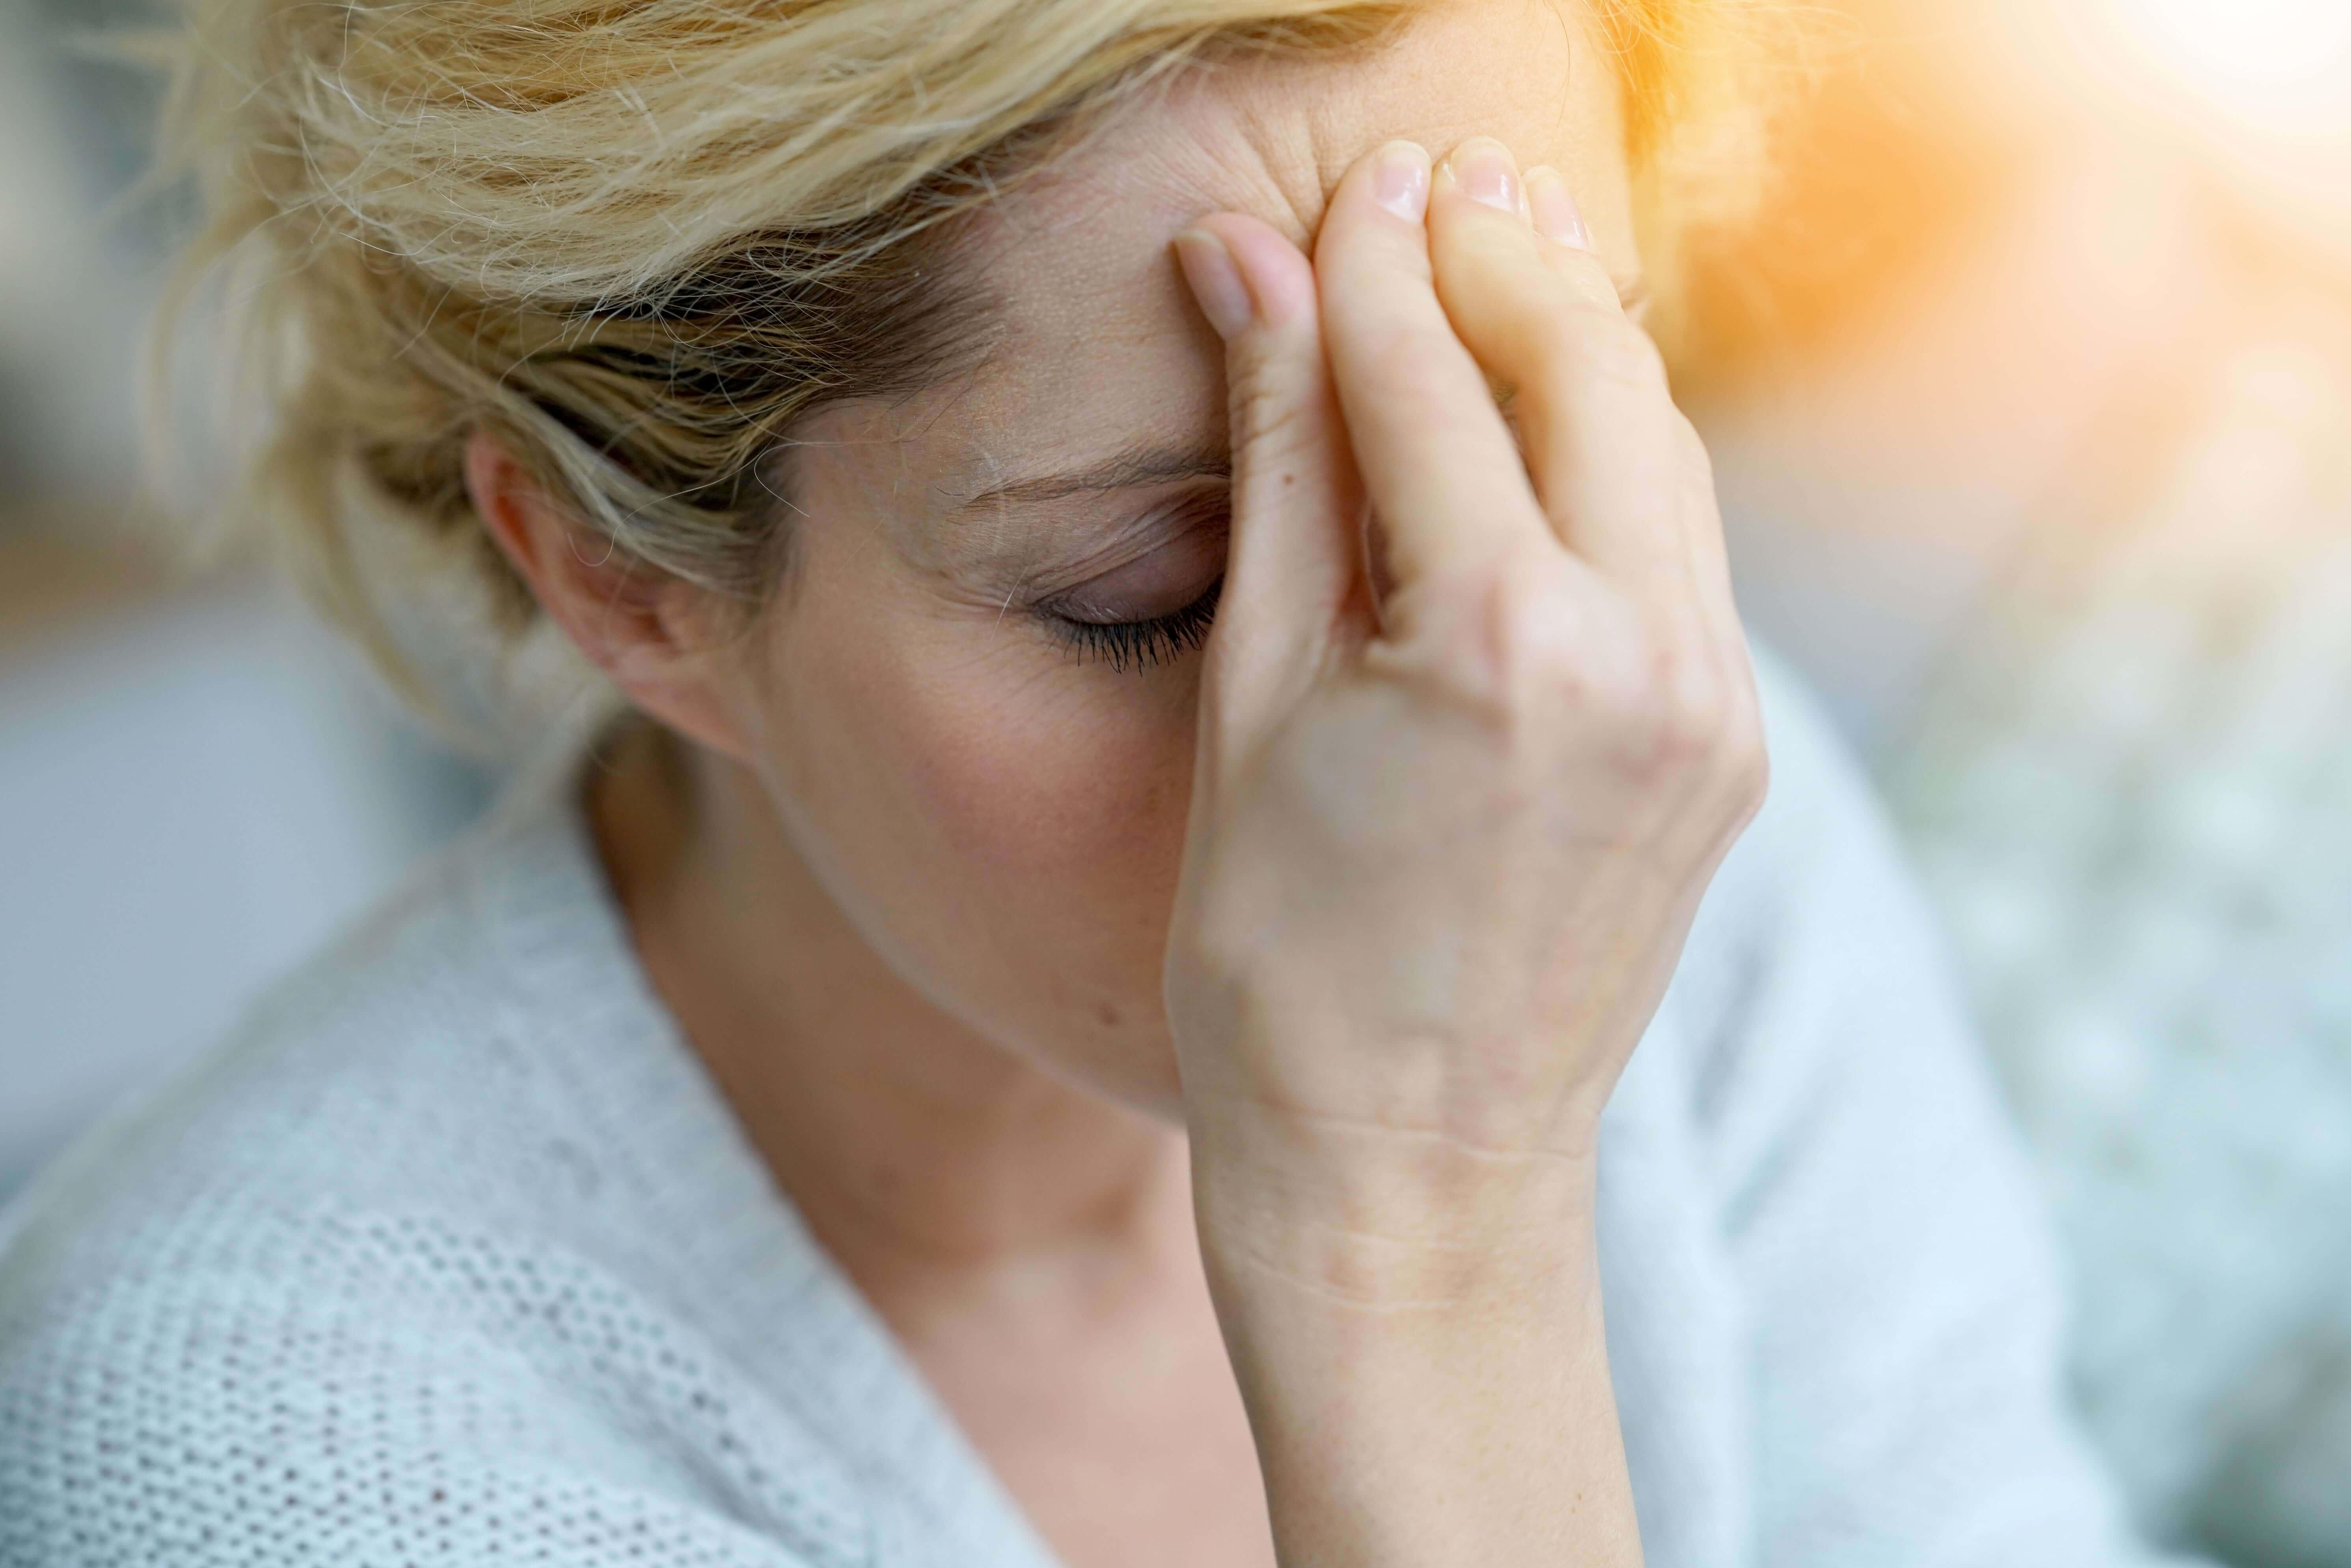 Stress- Related Headaches